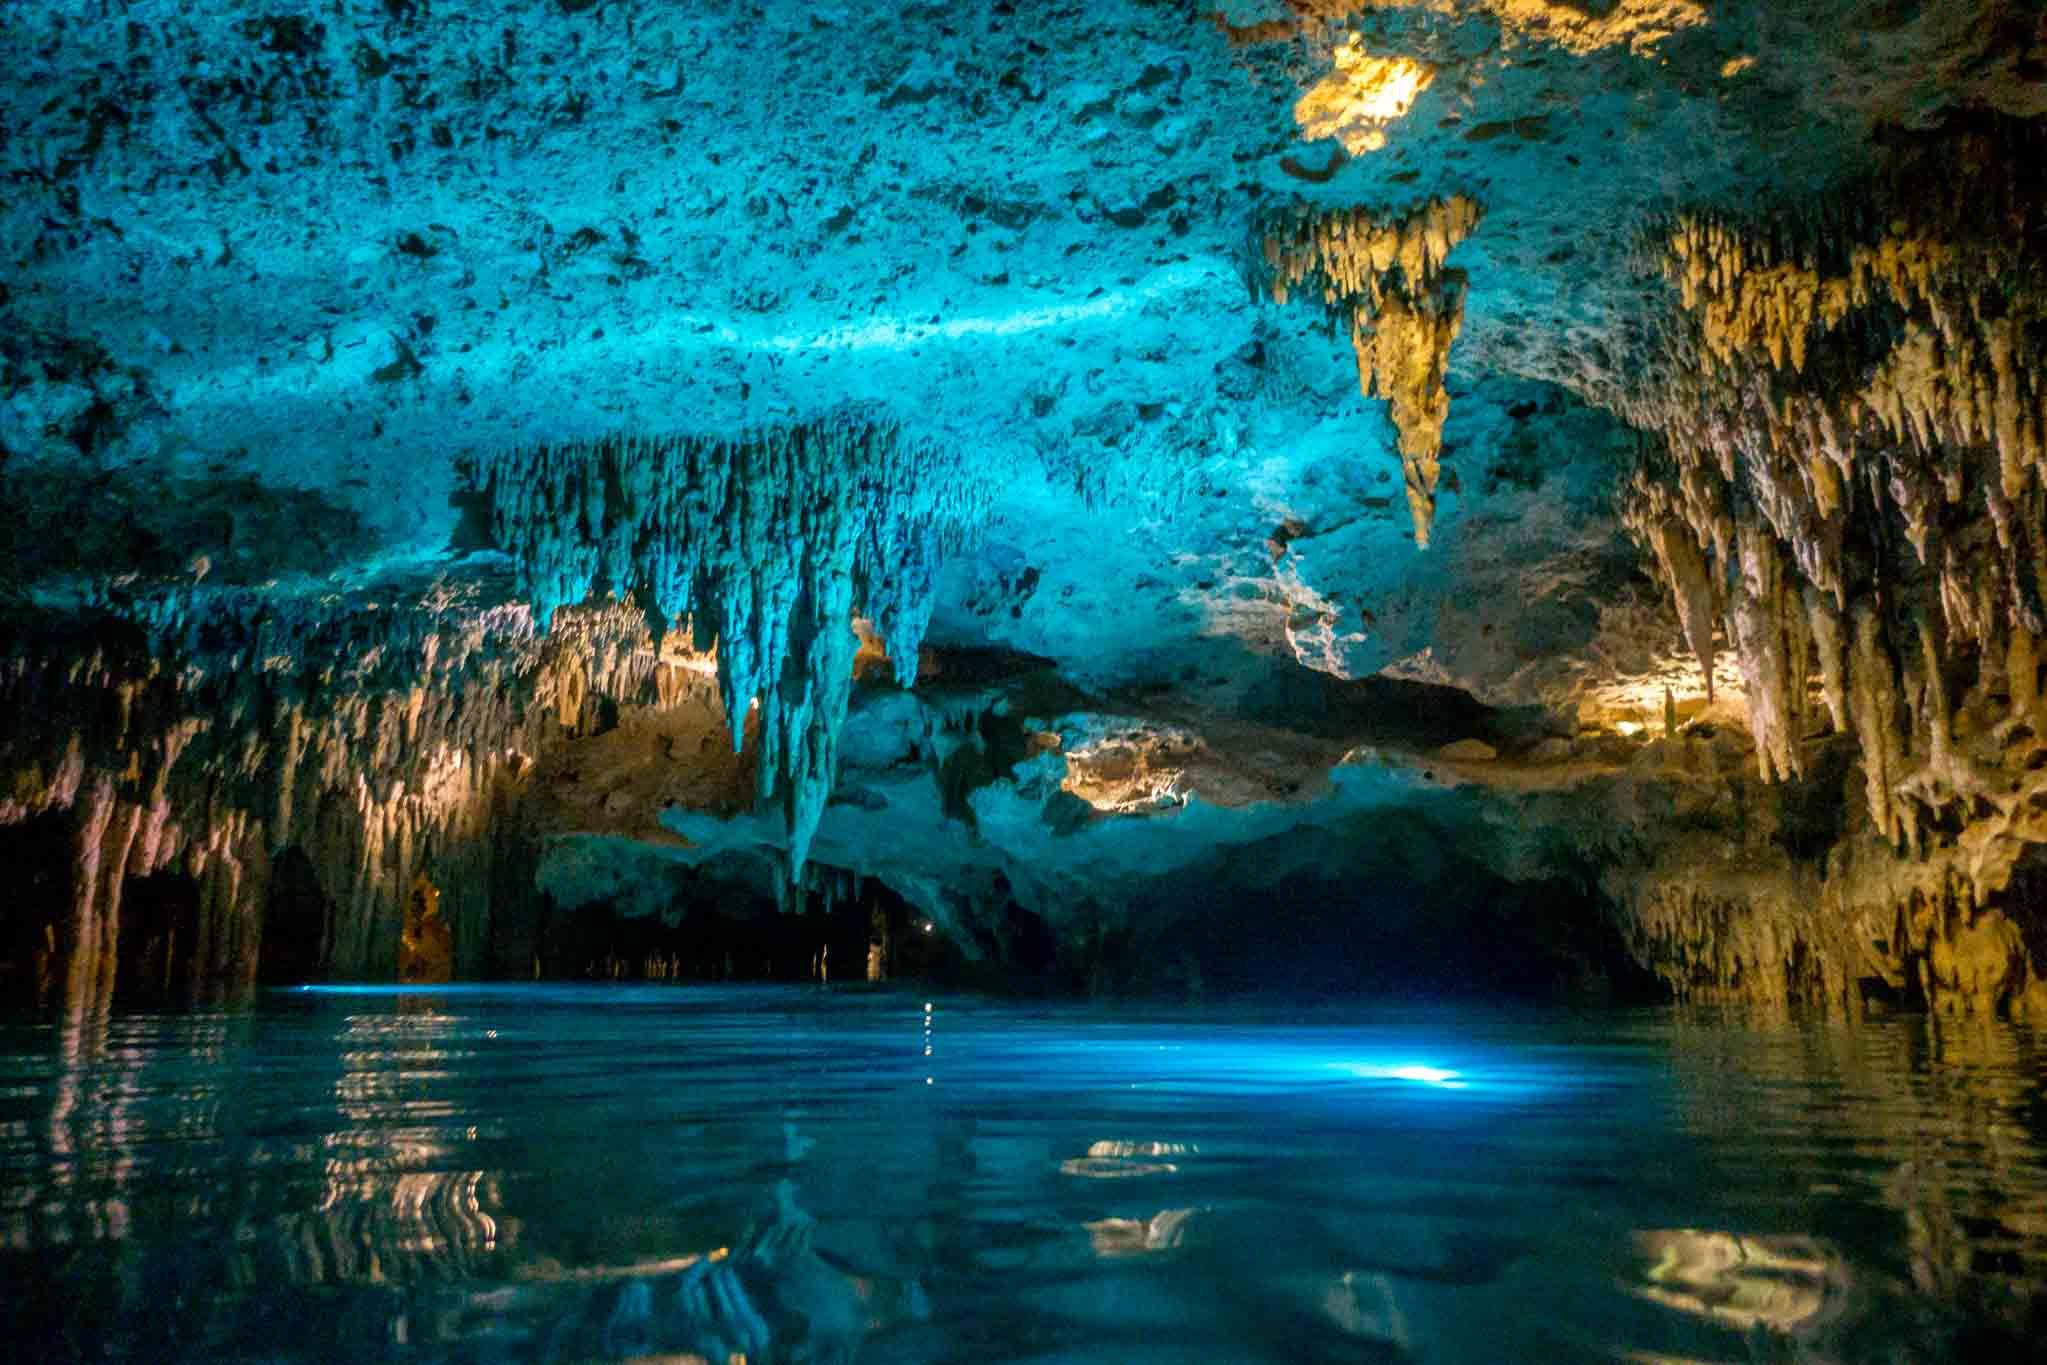 Underground river lit up with blue light